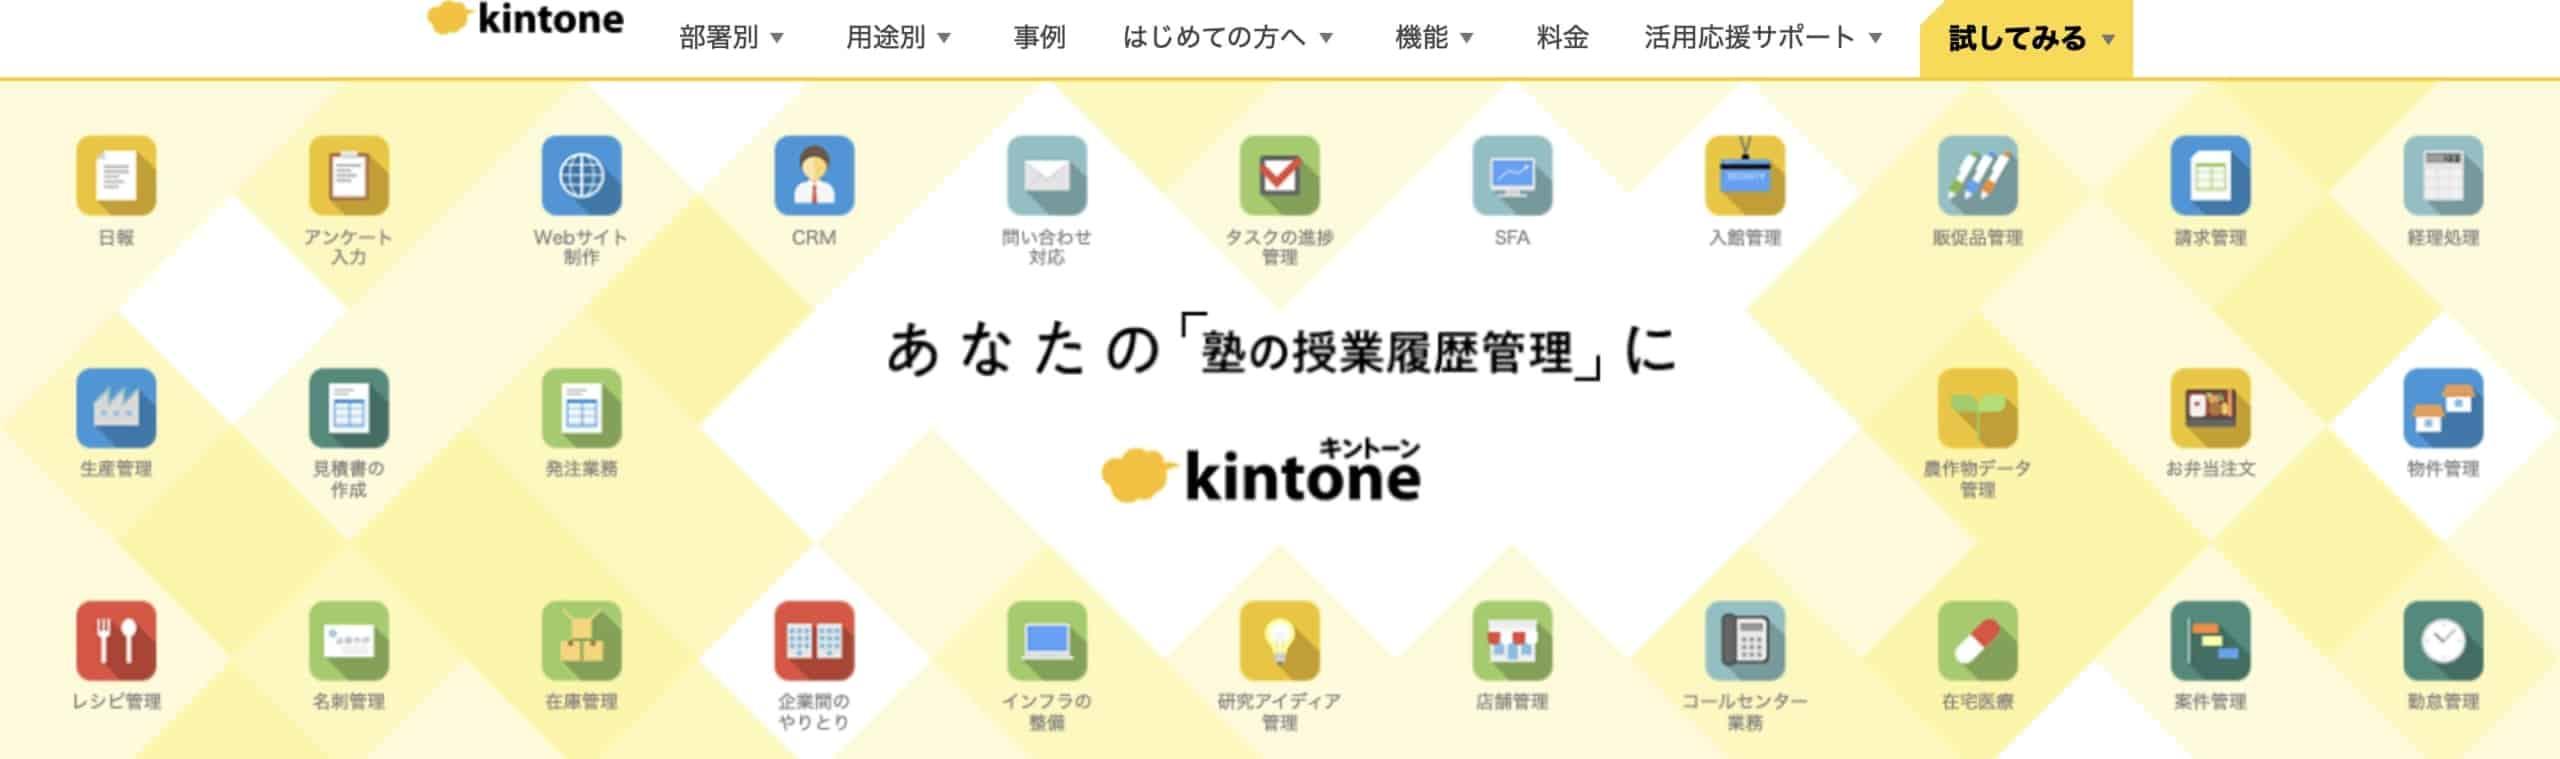 kintoneホームページ